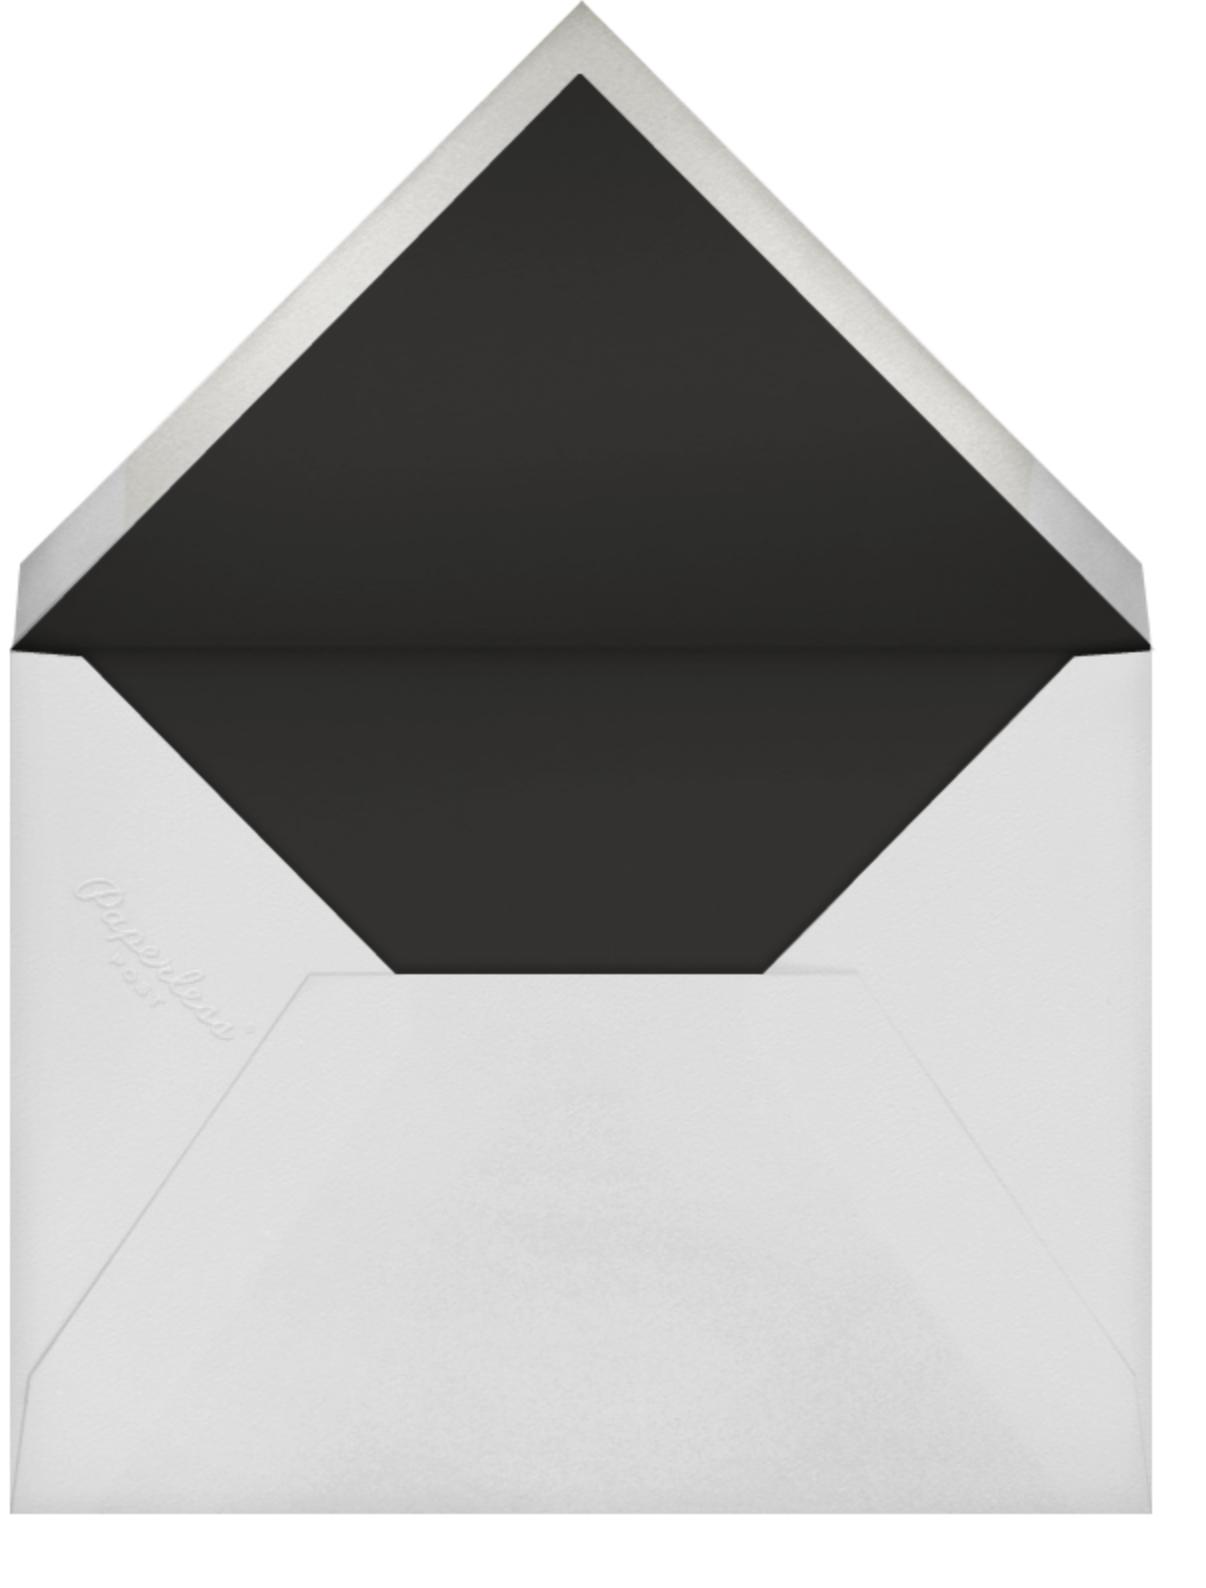 Radiant Swirls (Square) - Oscar de la Renta - Anniversary party - envelope back